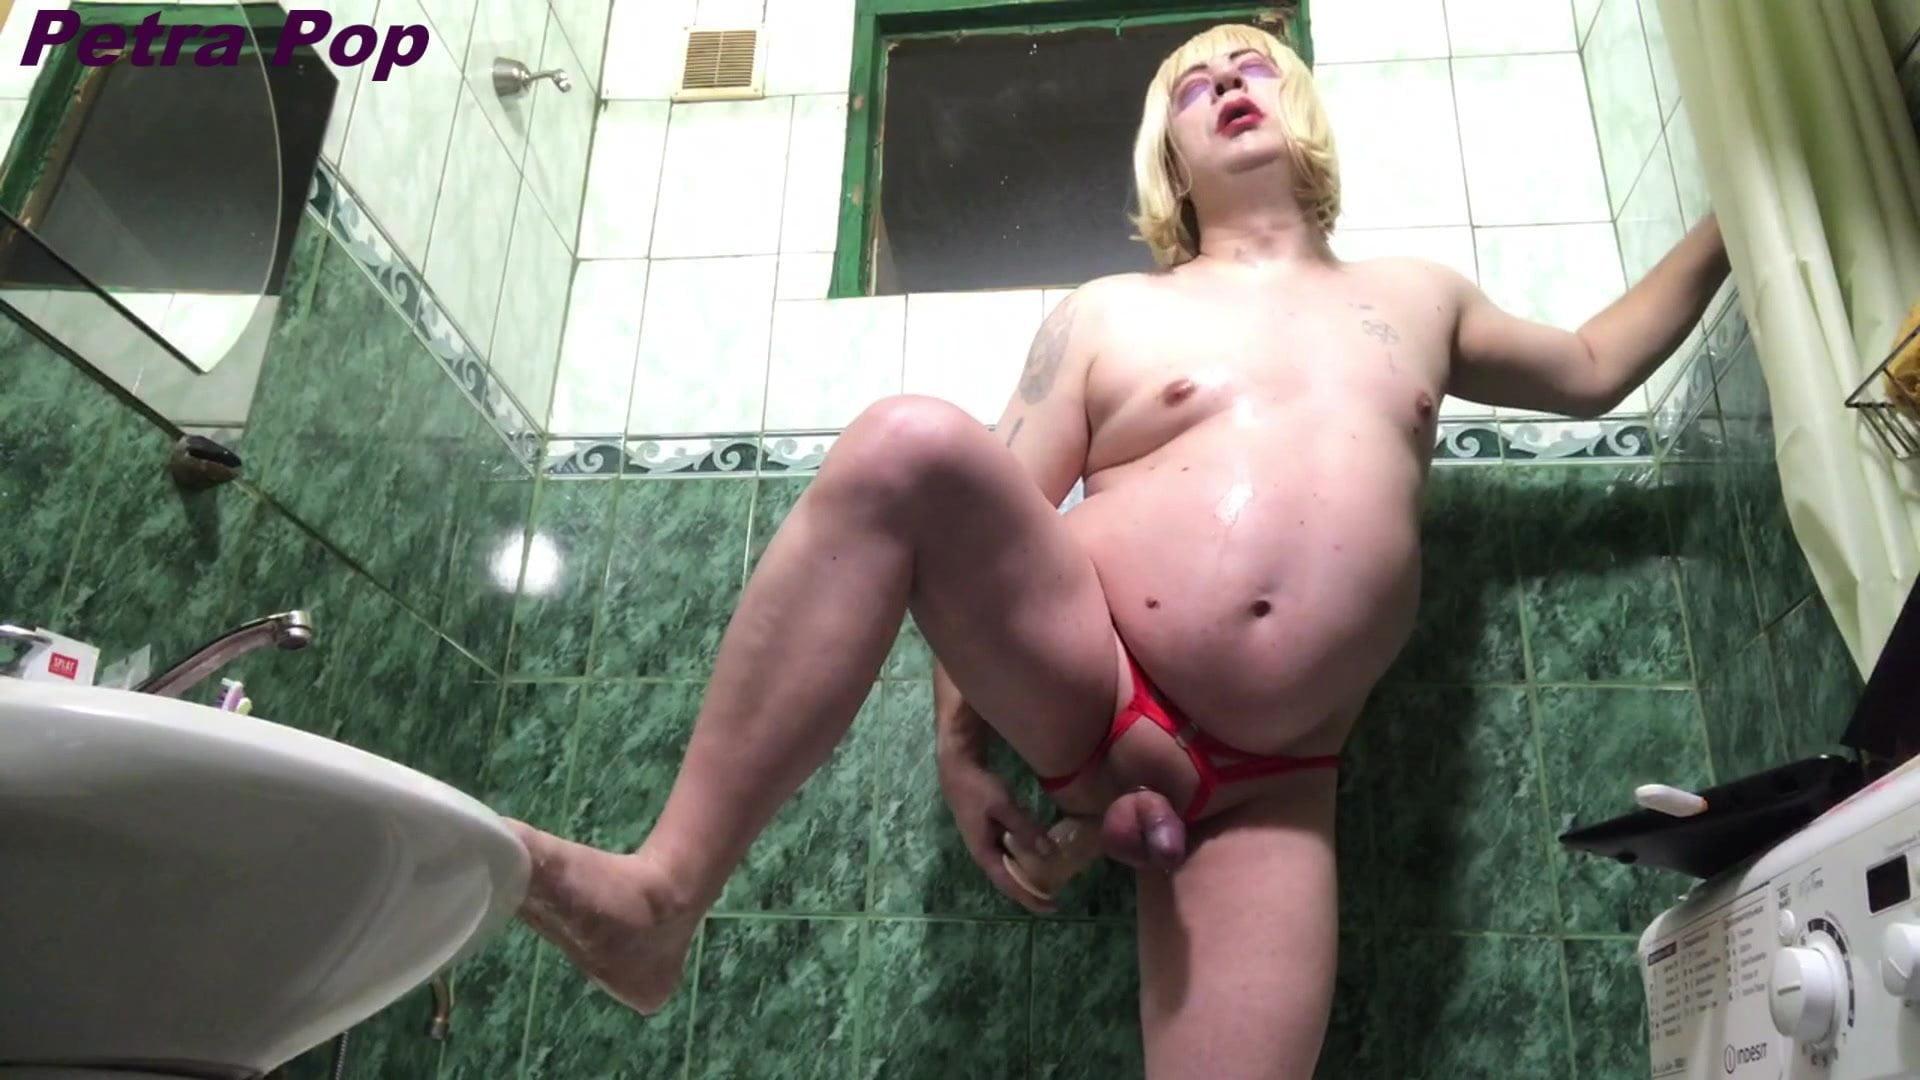 chubby girl fucked shower